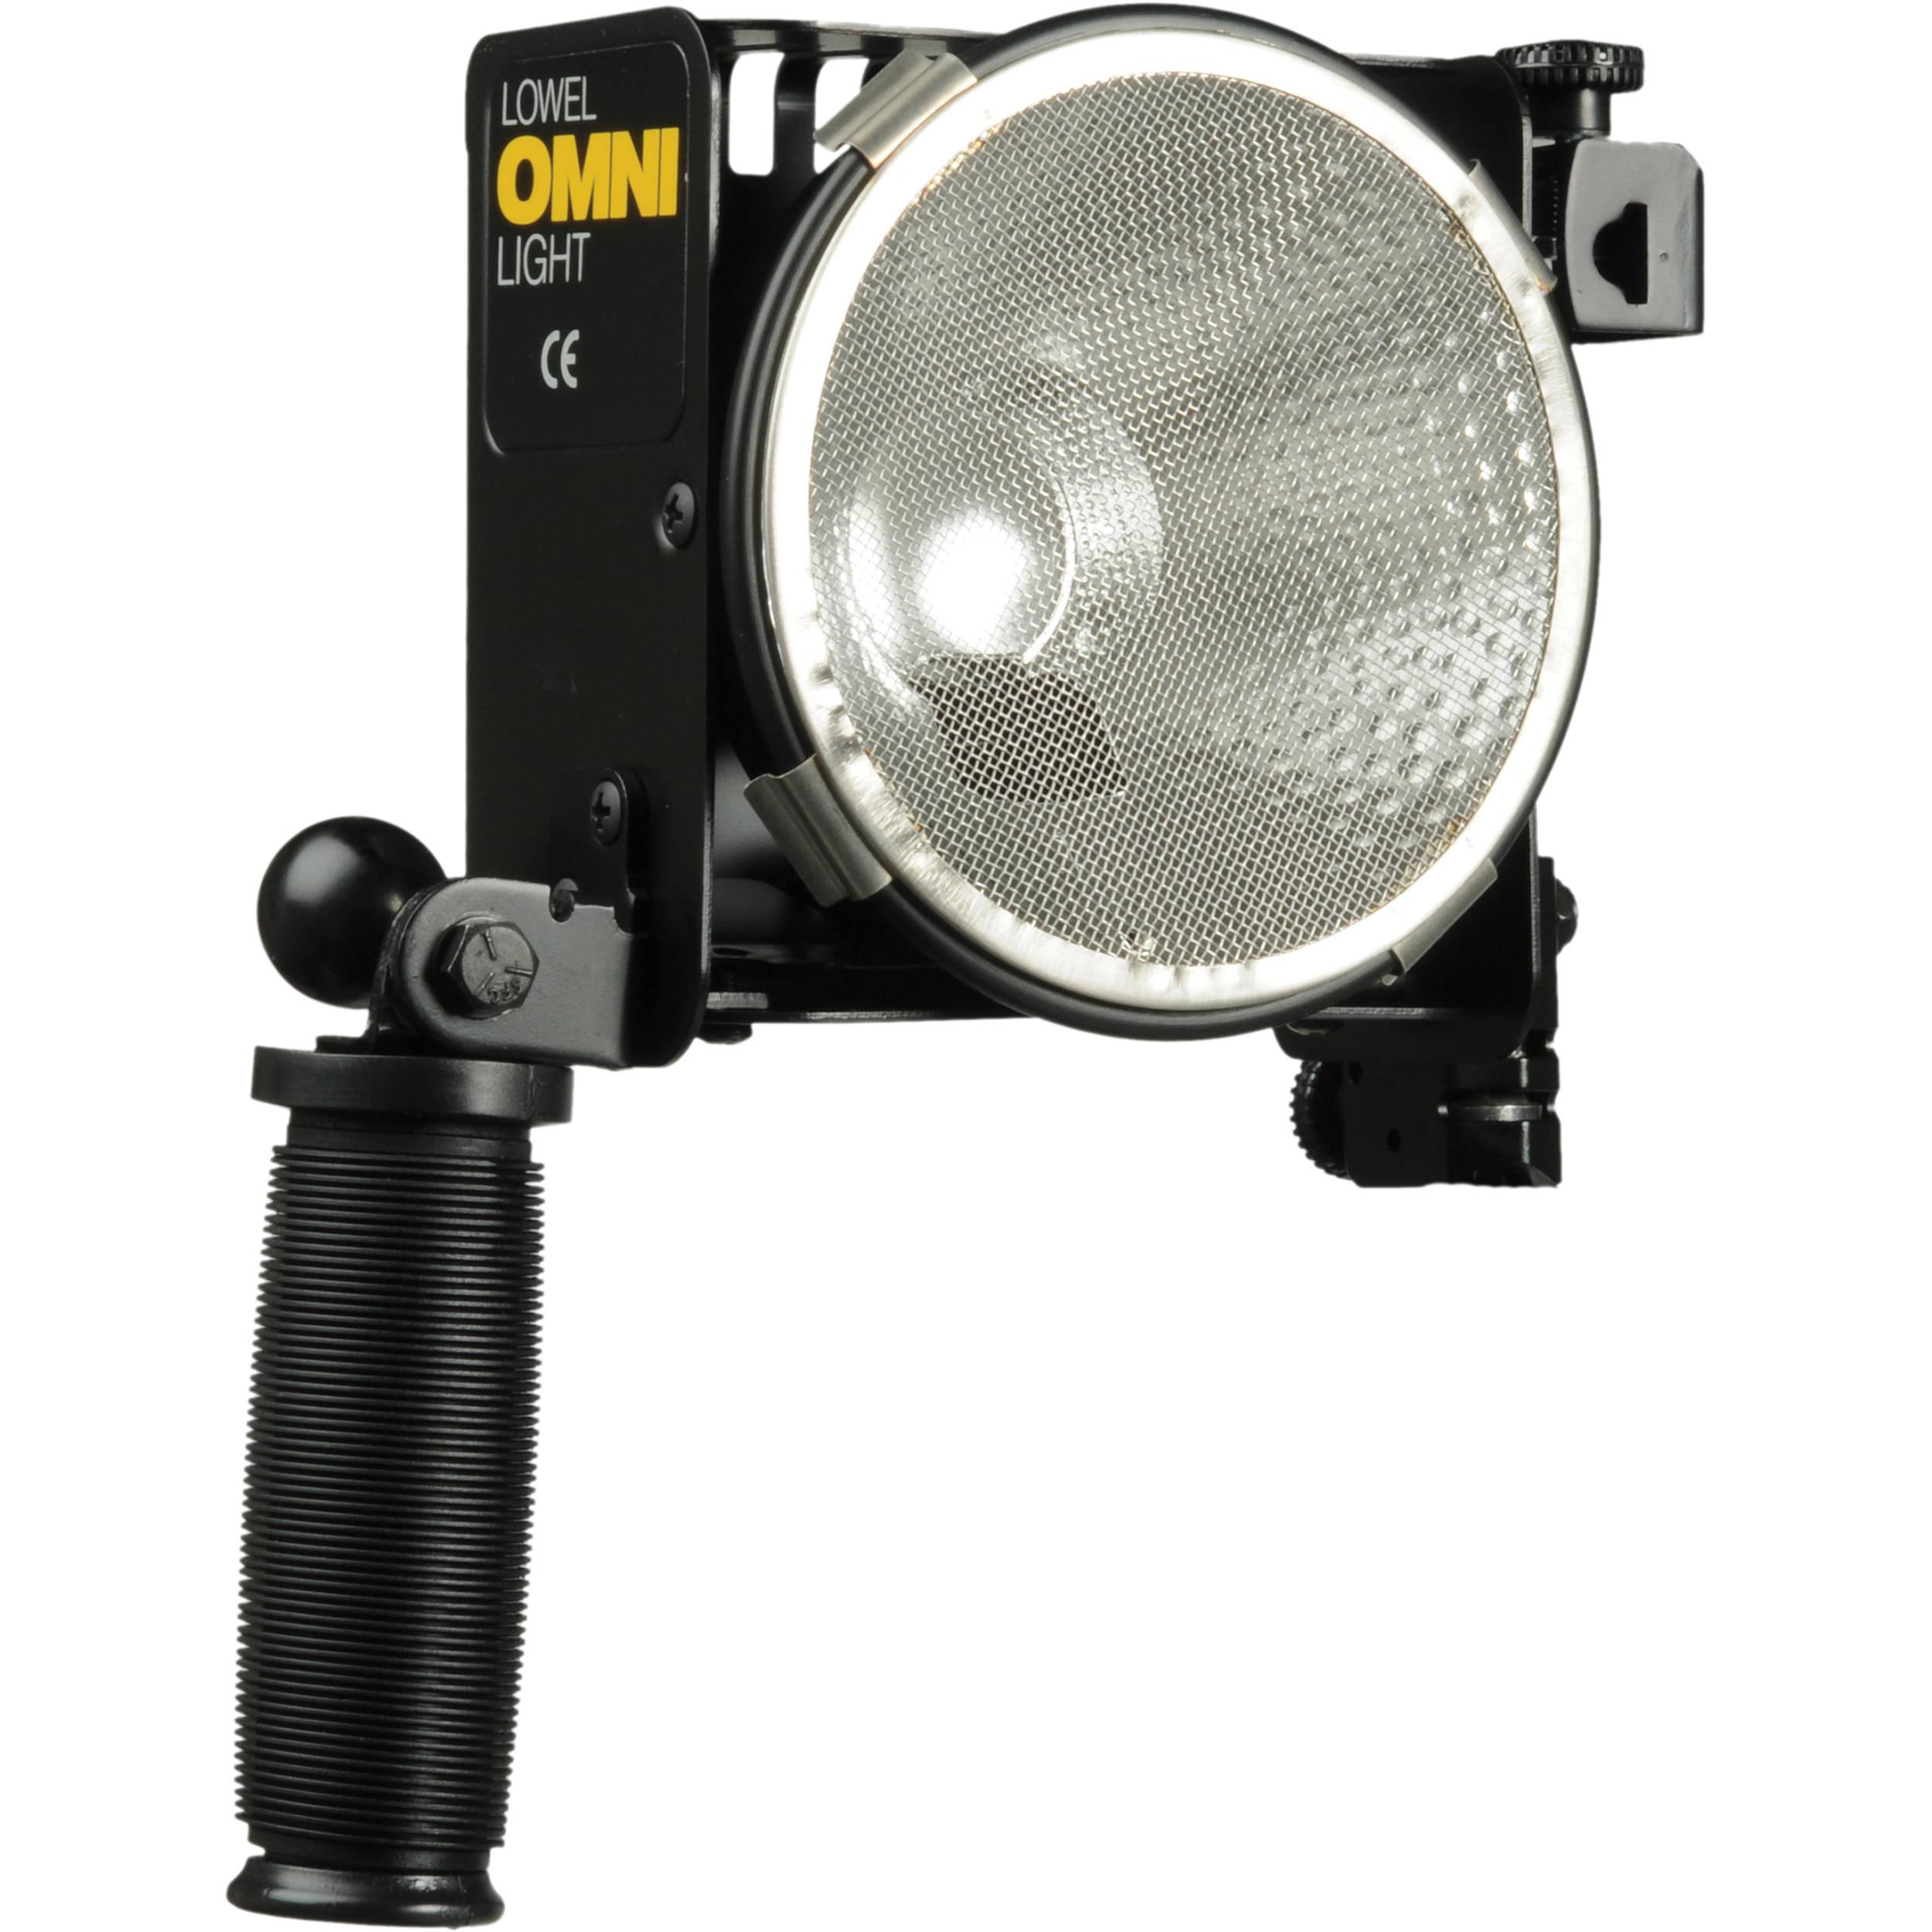 lowel omni light 500 watt focus flood light o1 10 b h photo. Black Bedroom Furniture Sets. Home Design Ideas